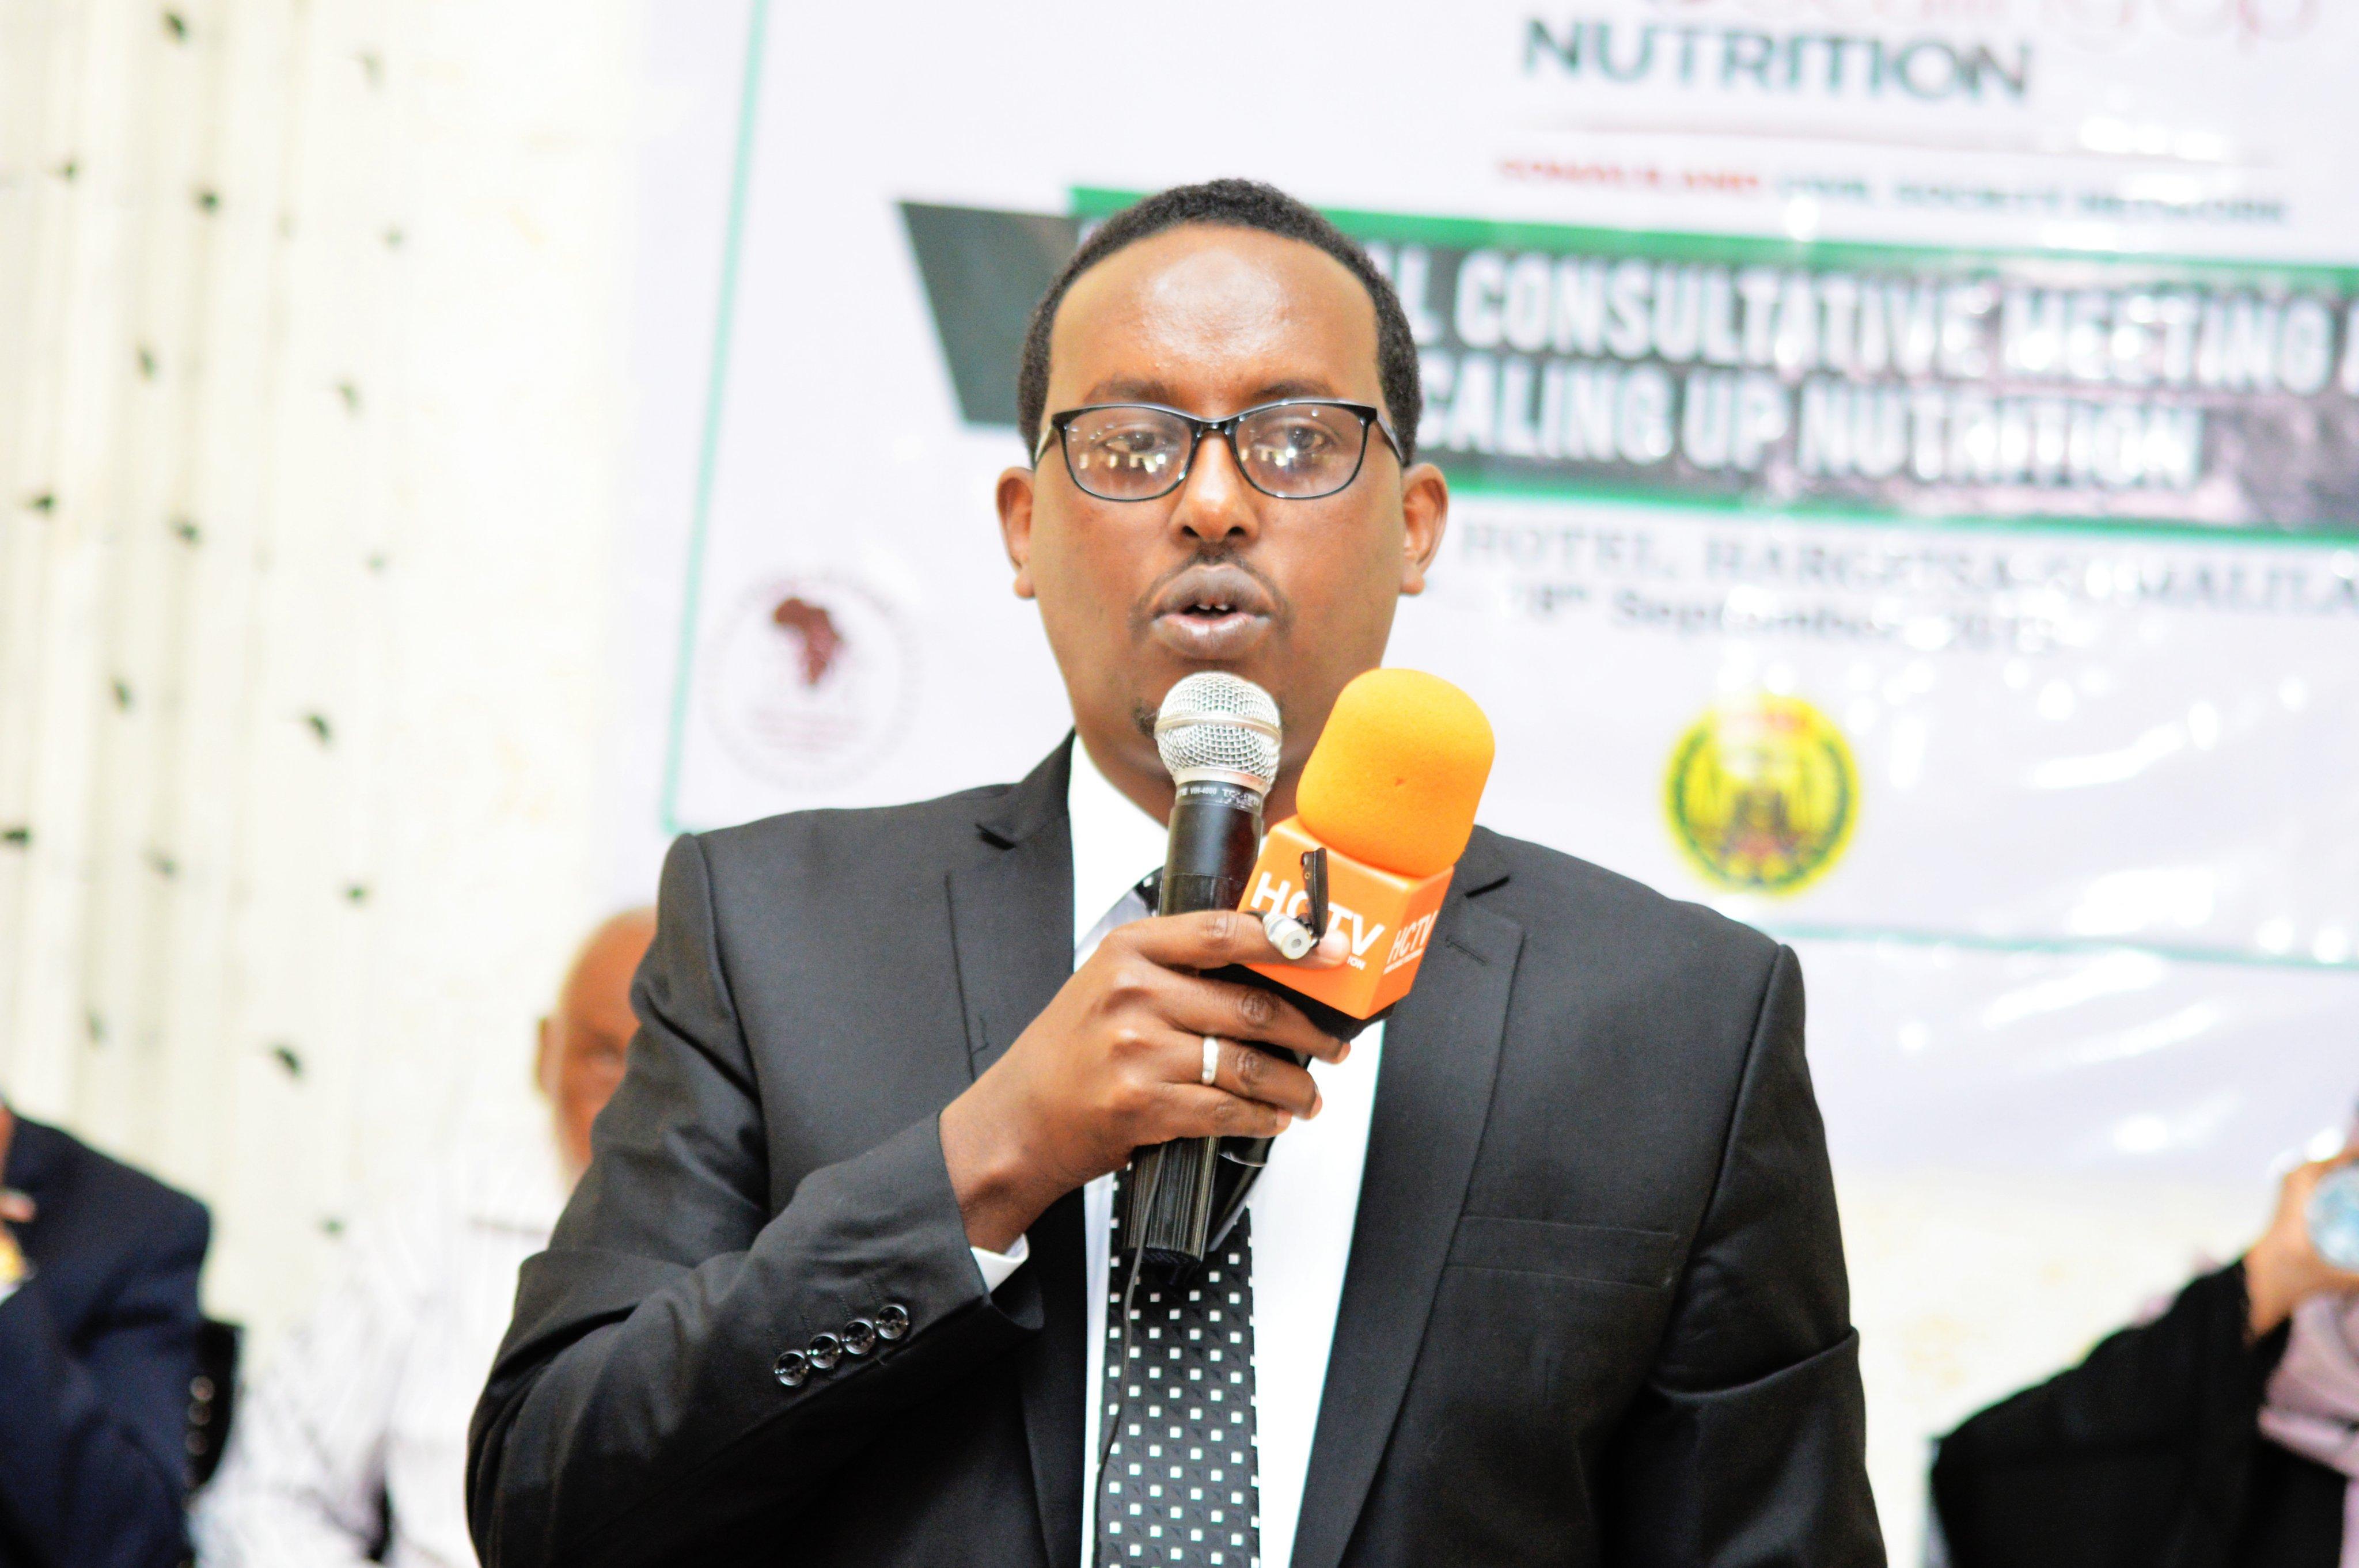 Somaliland Minister of Health Development Omer Ali abdilahi